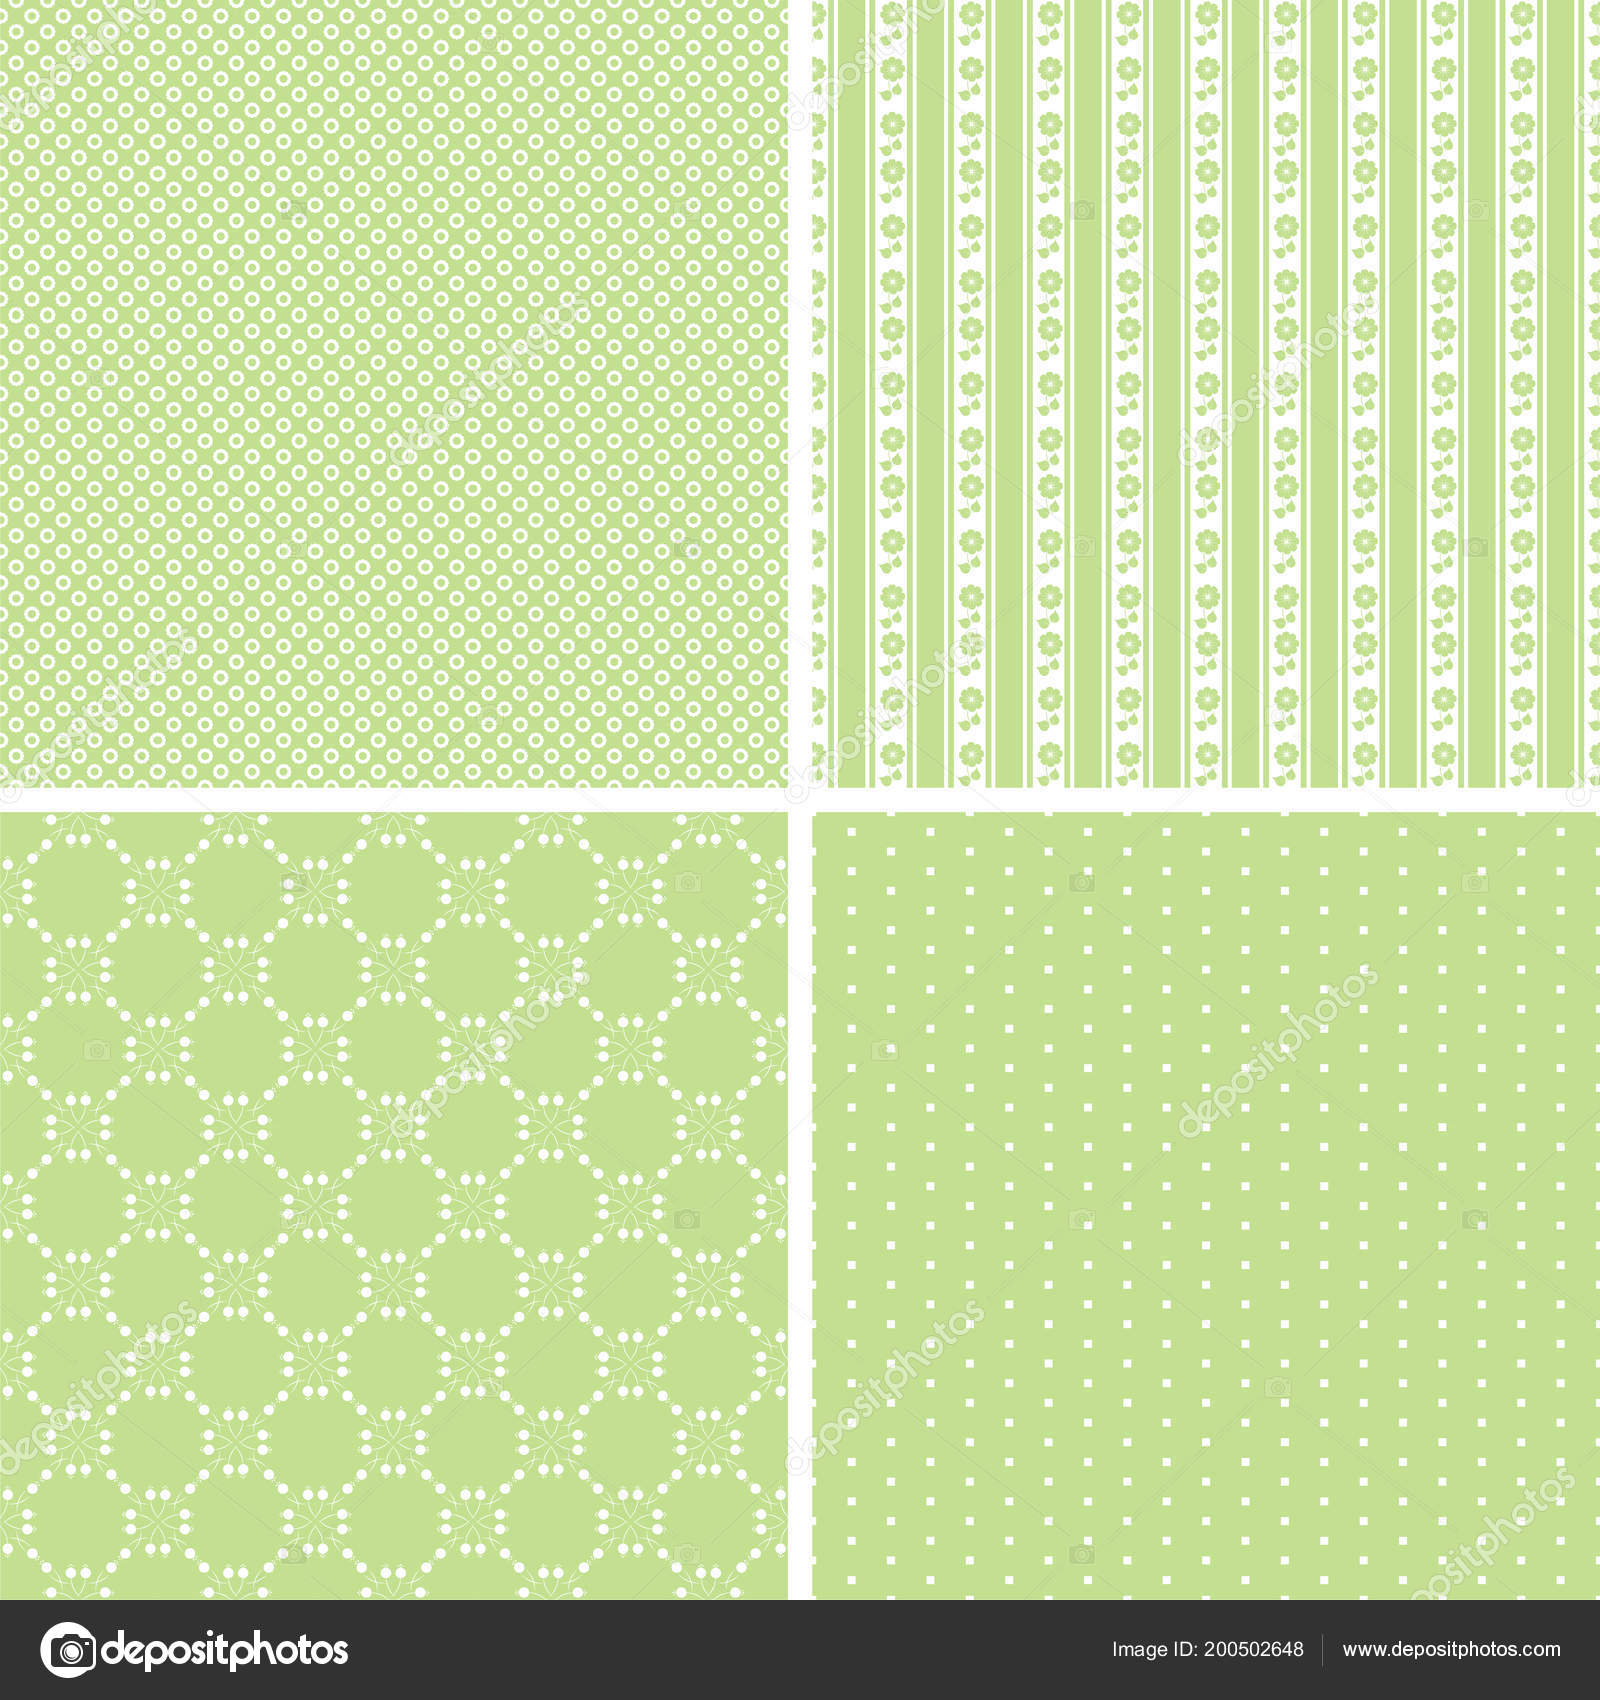 Retro Different Seamless Patterns Vector Illustration Beauty Design Stock Vector